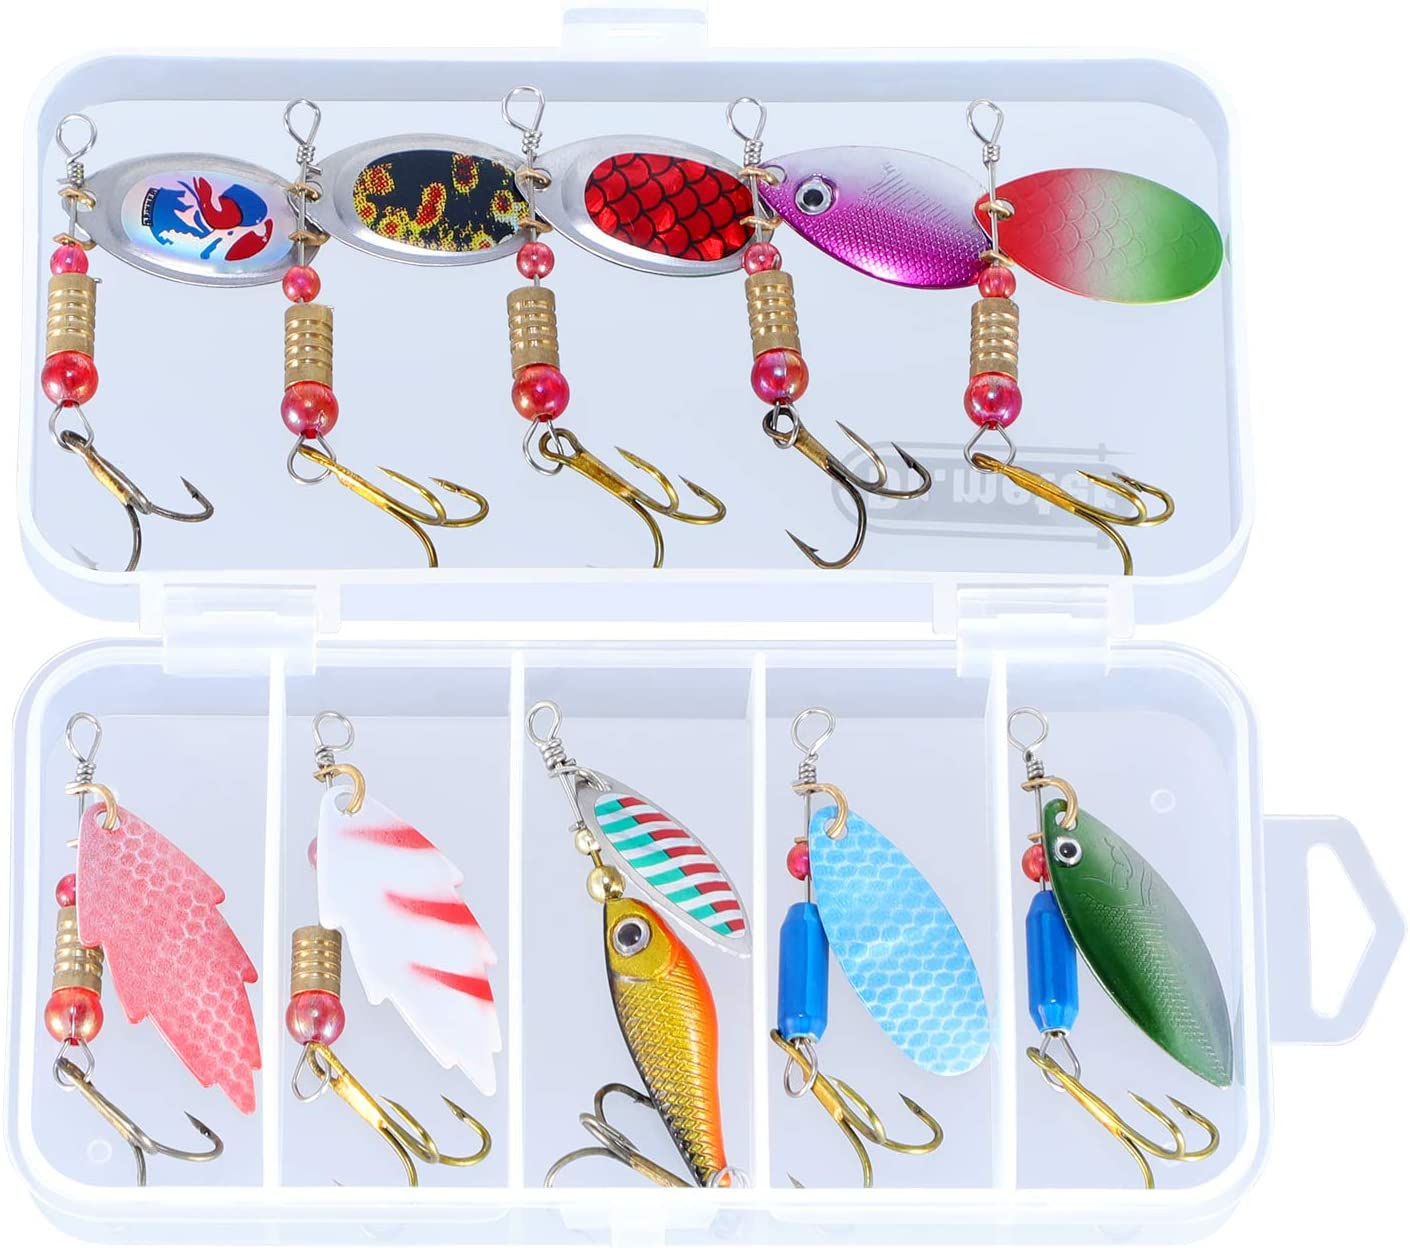 10 Fishing Lure Spinnerbait Bass Trout Salmon Hard Metal Spinner Baits Kit Box